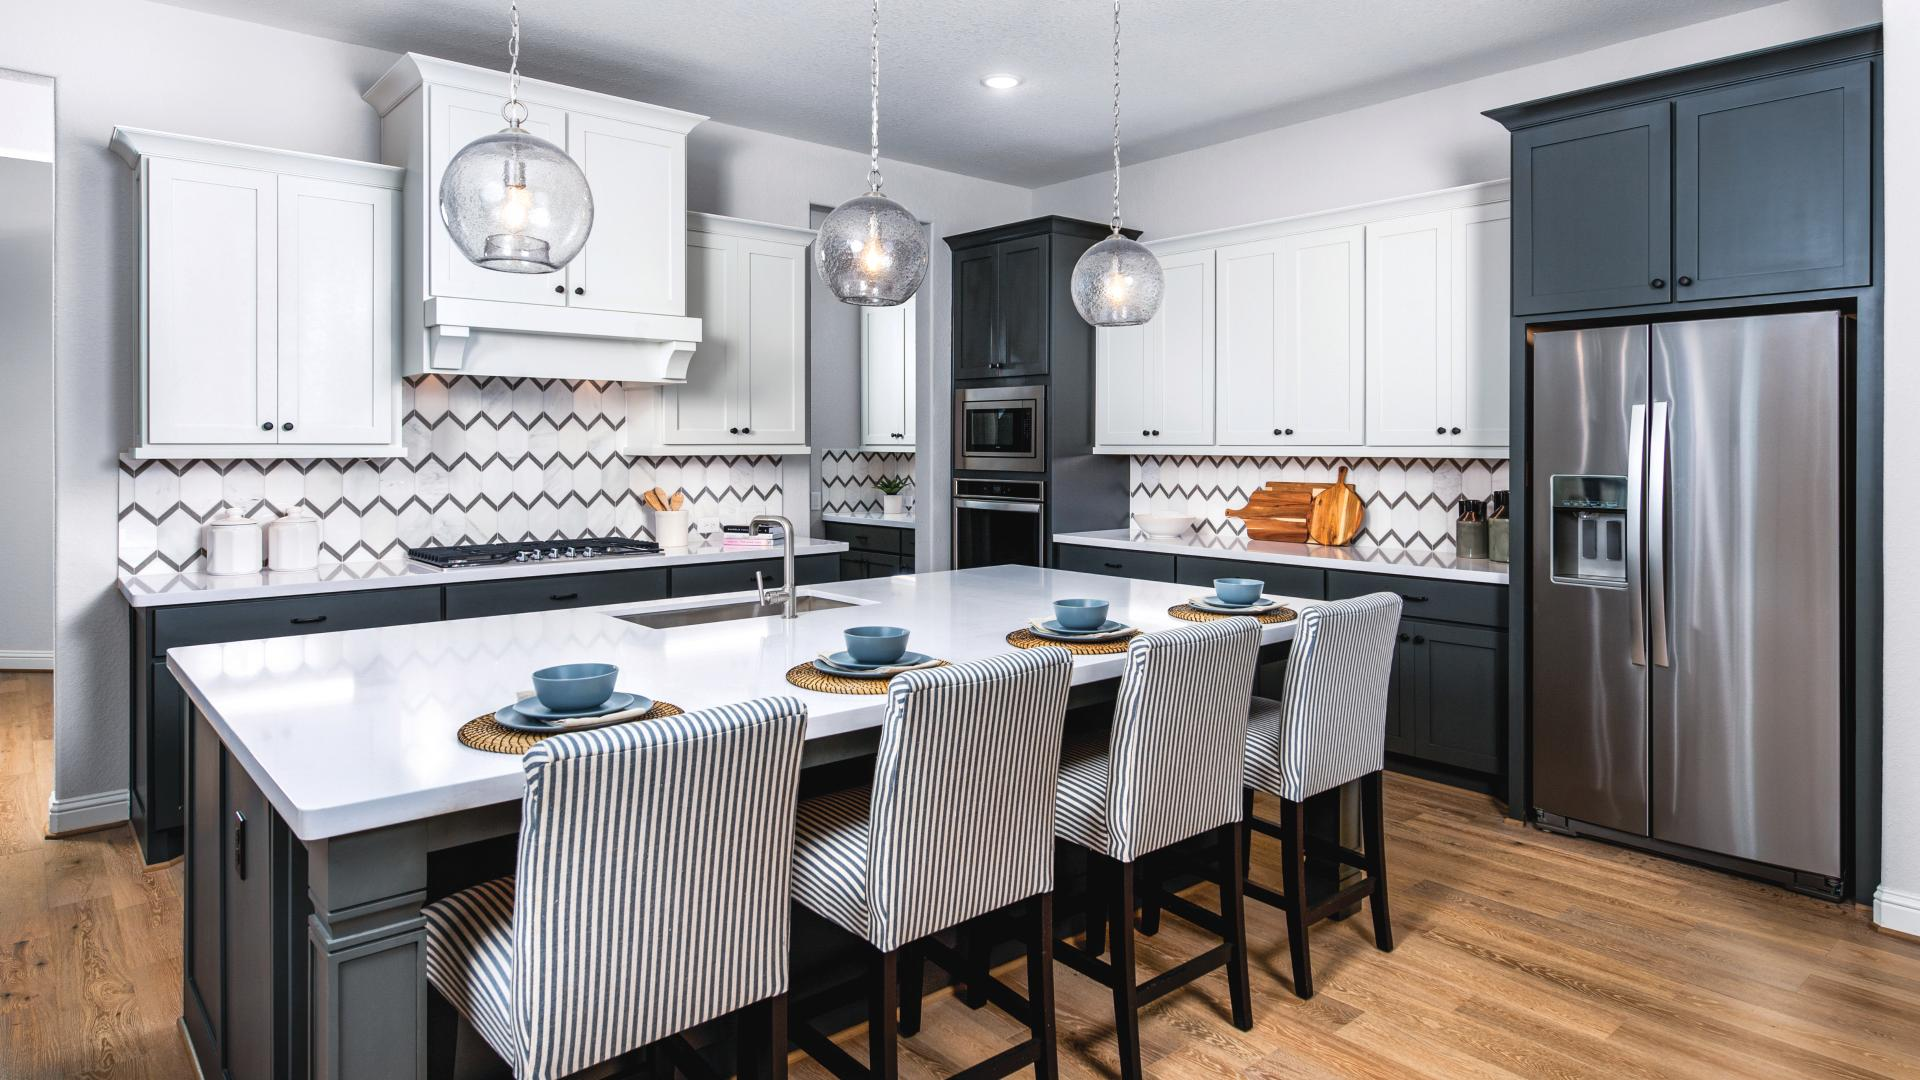 Stunning Watson chef's kitchen